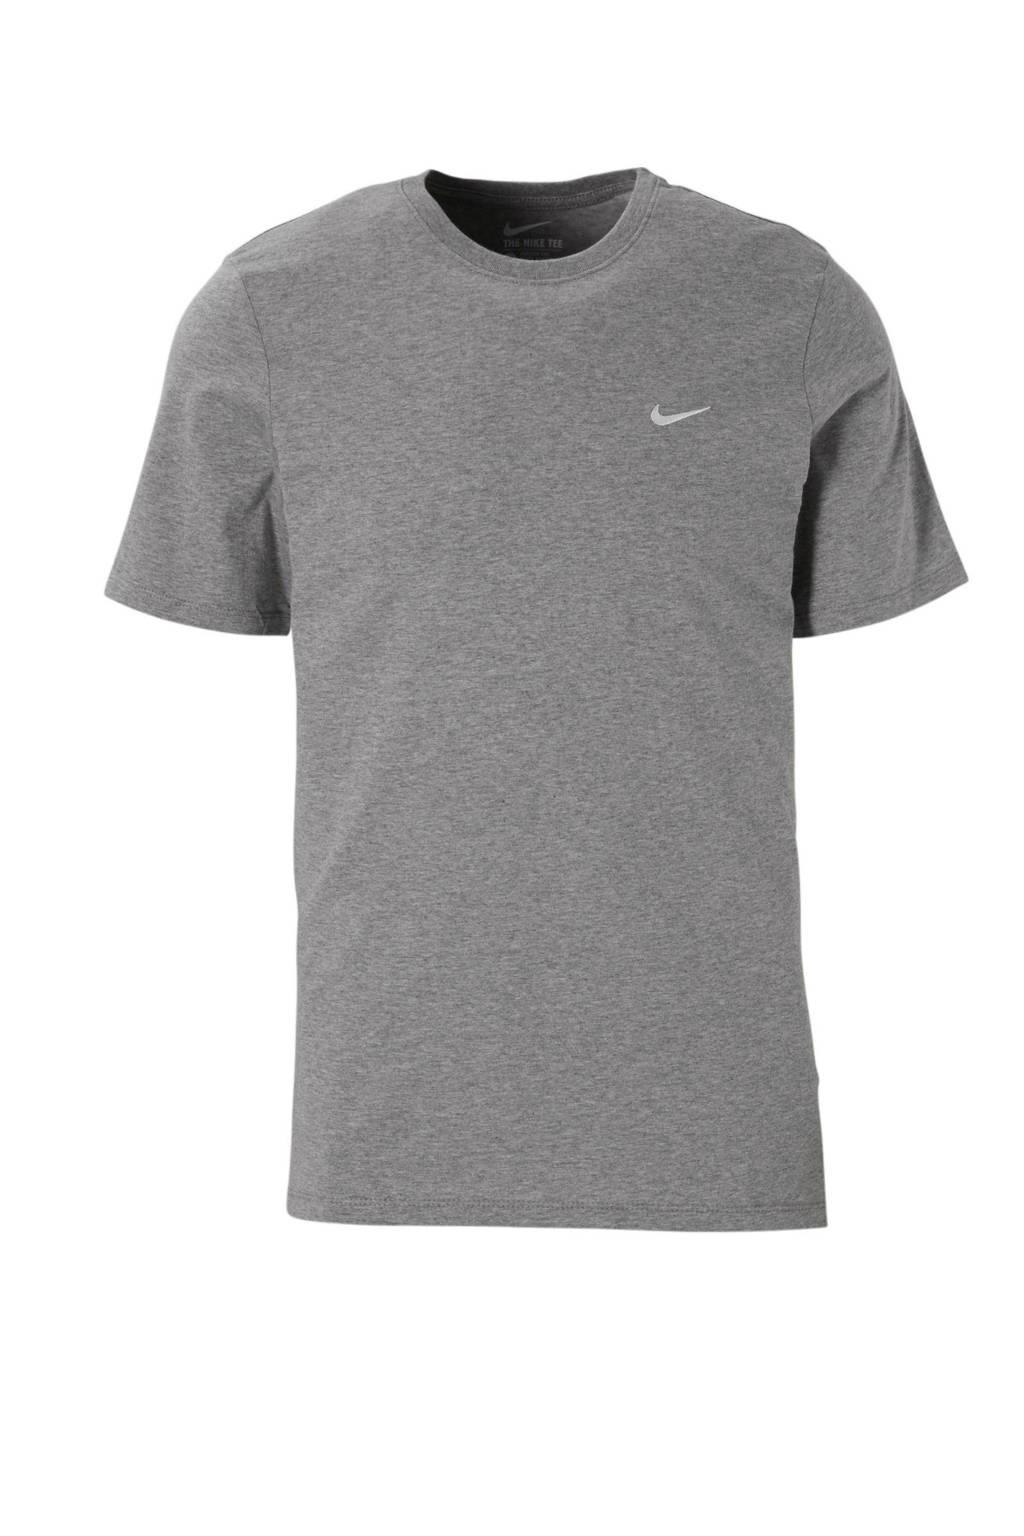 Nike   sport T-shirt, Grijs melange